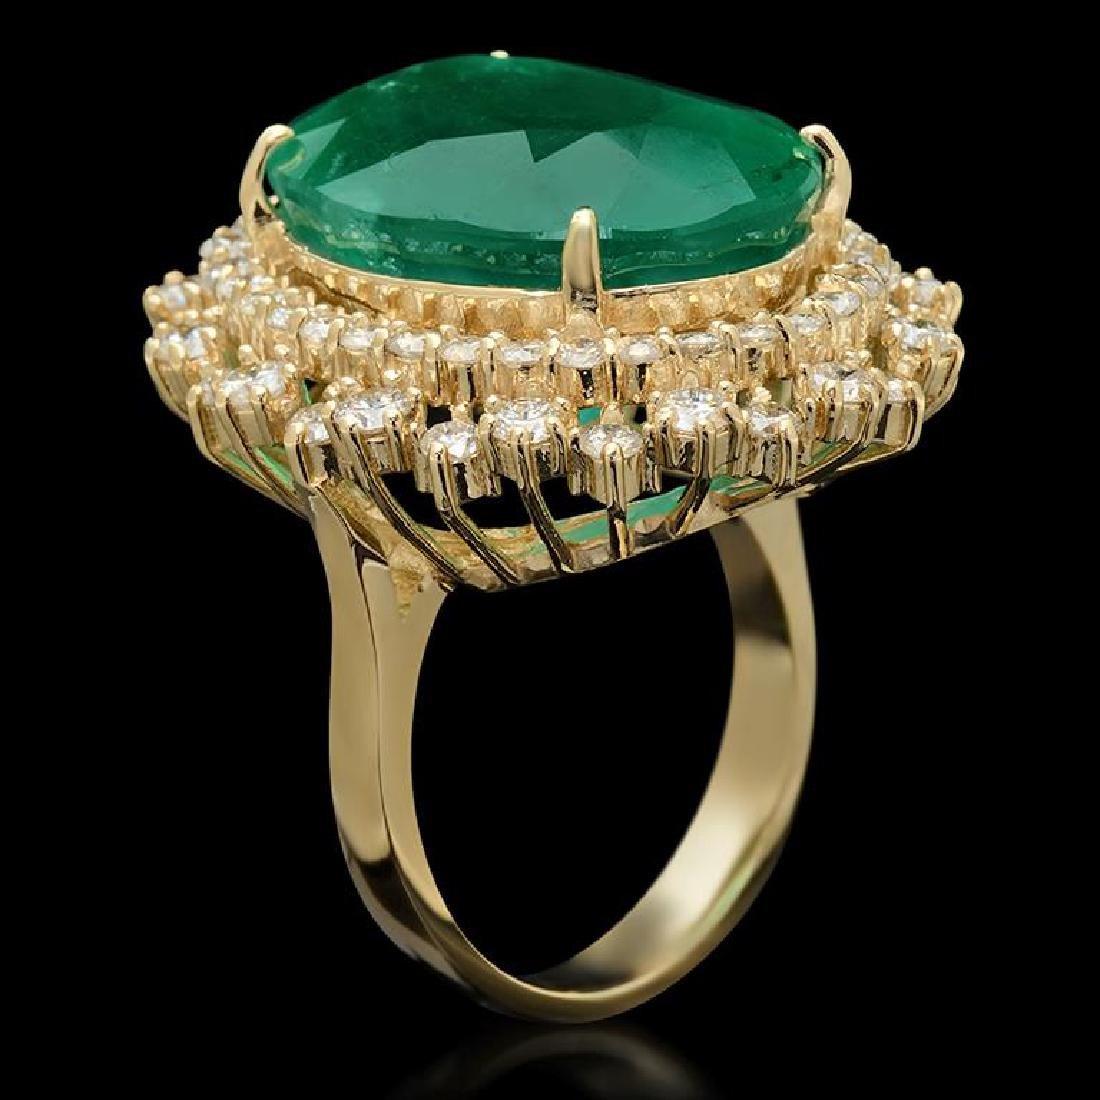 14K Gold 17.93ct Emerald 2.10ct Diamond Ring - 2